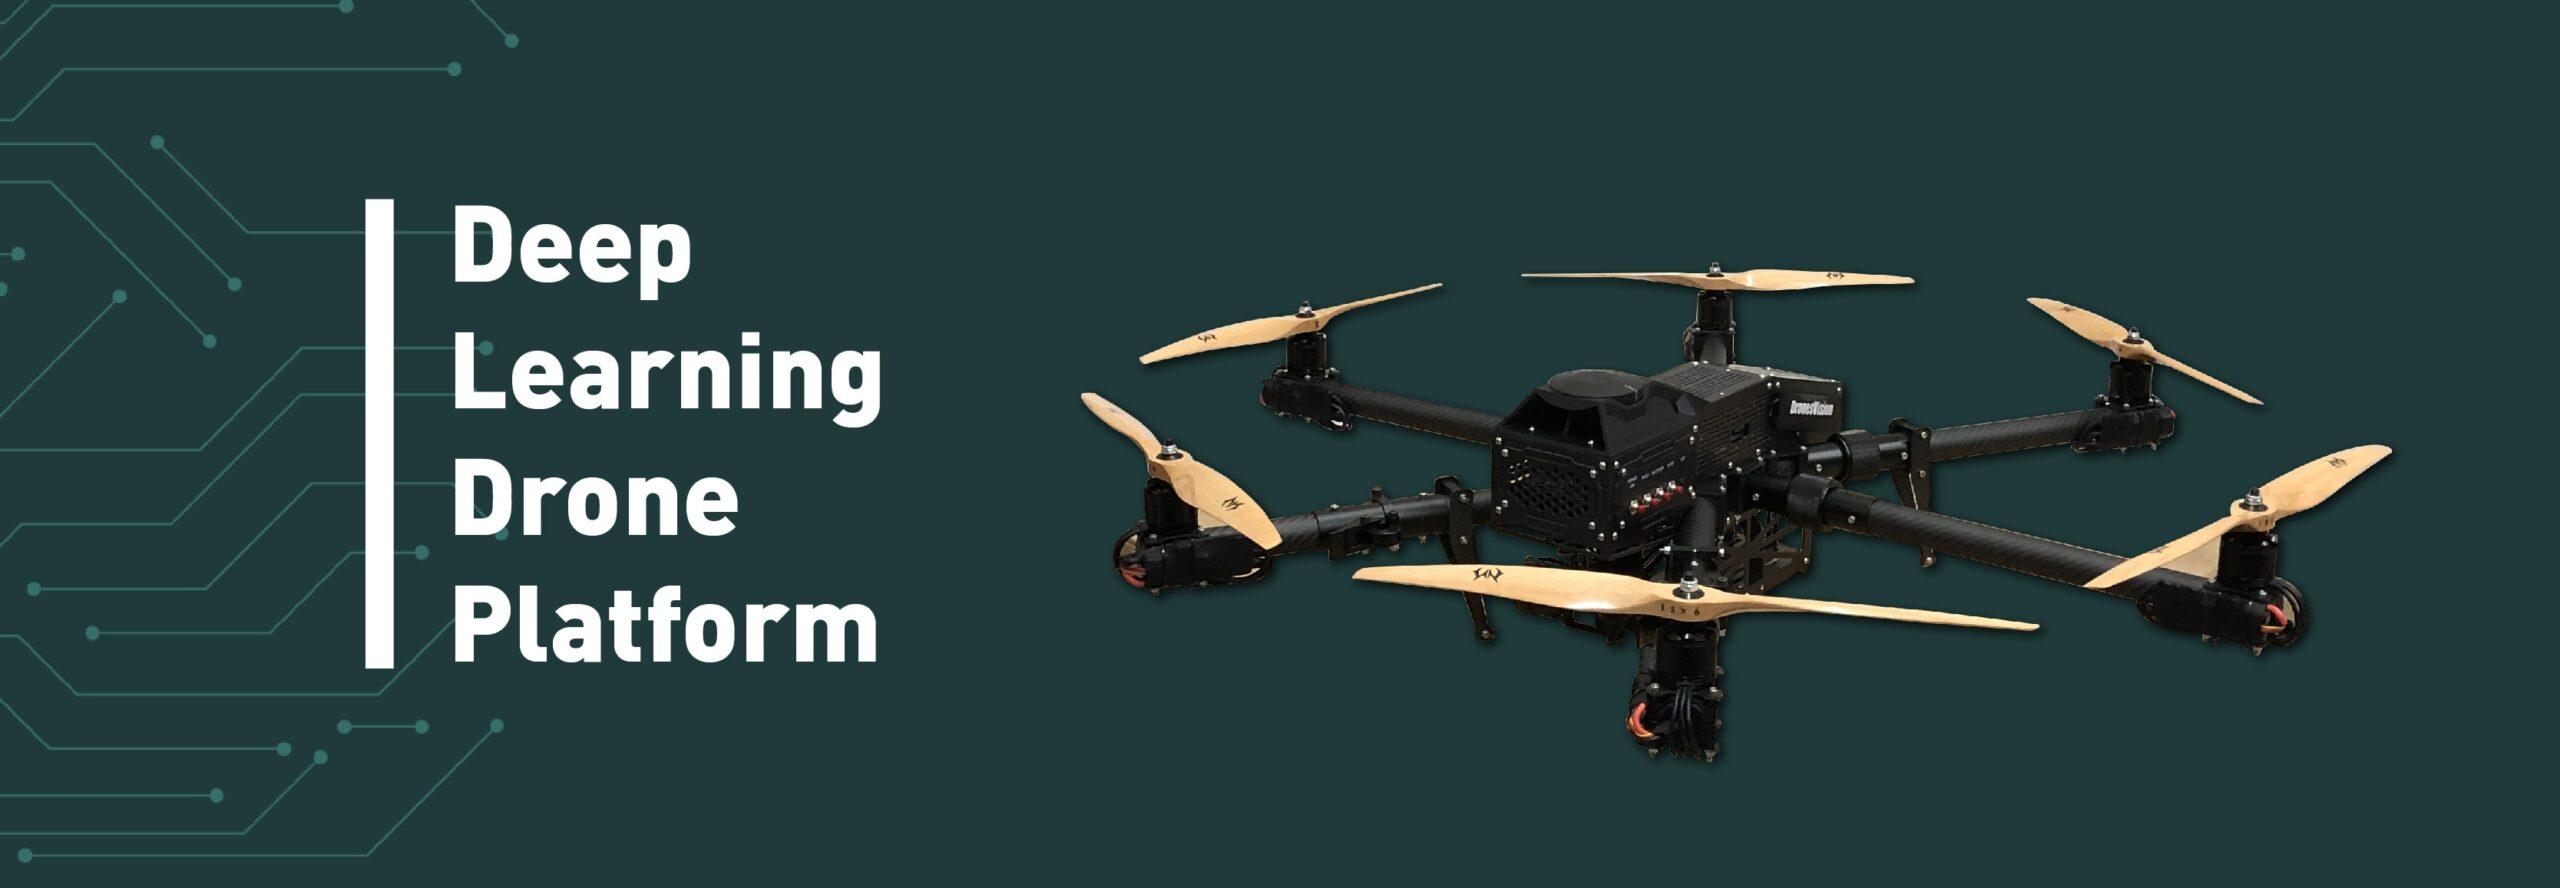 Deep Learning Drone Platform-banner